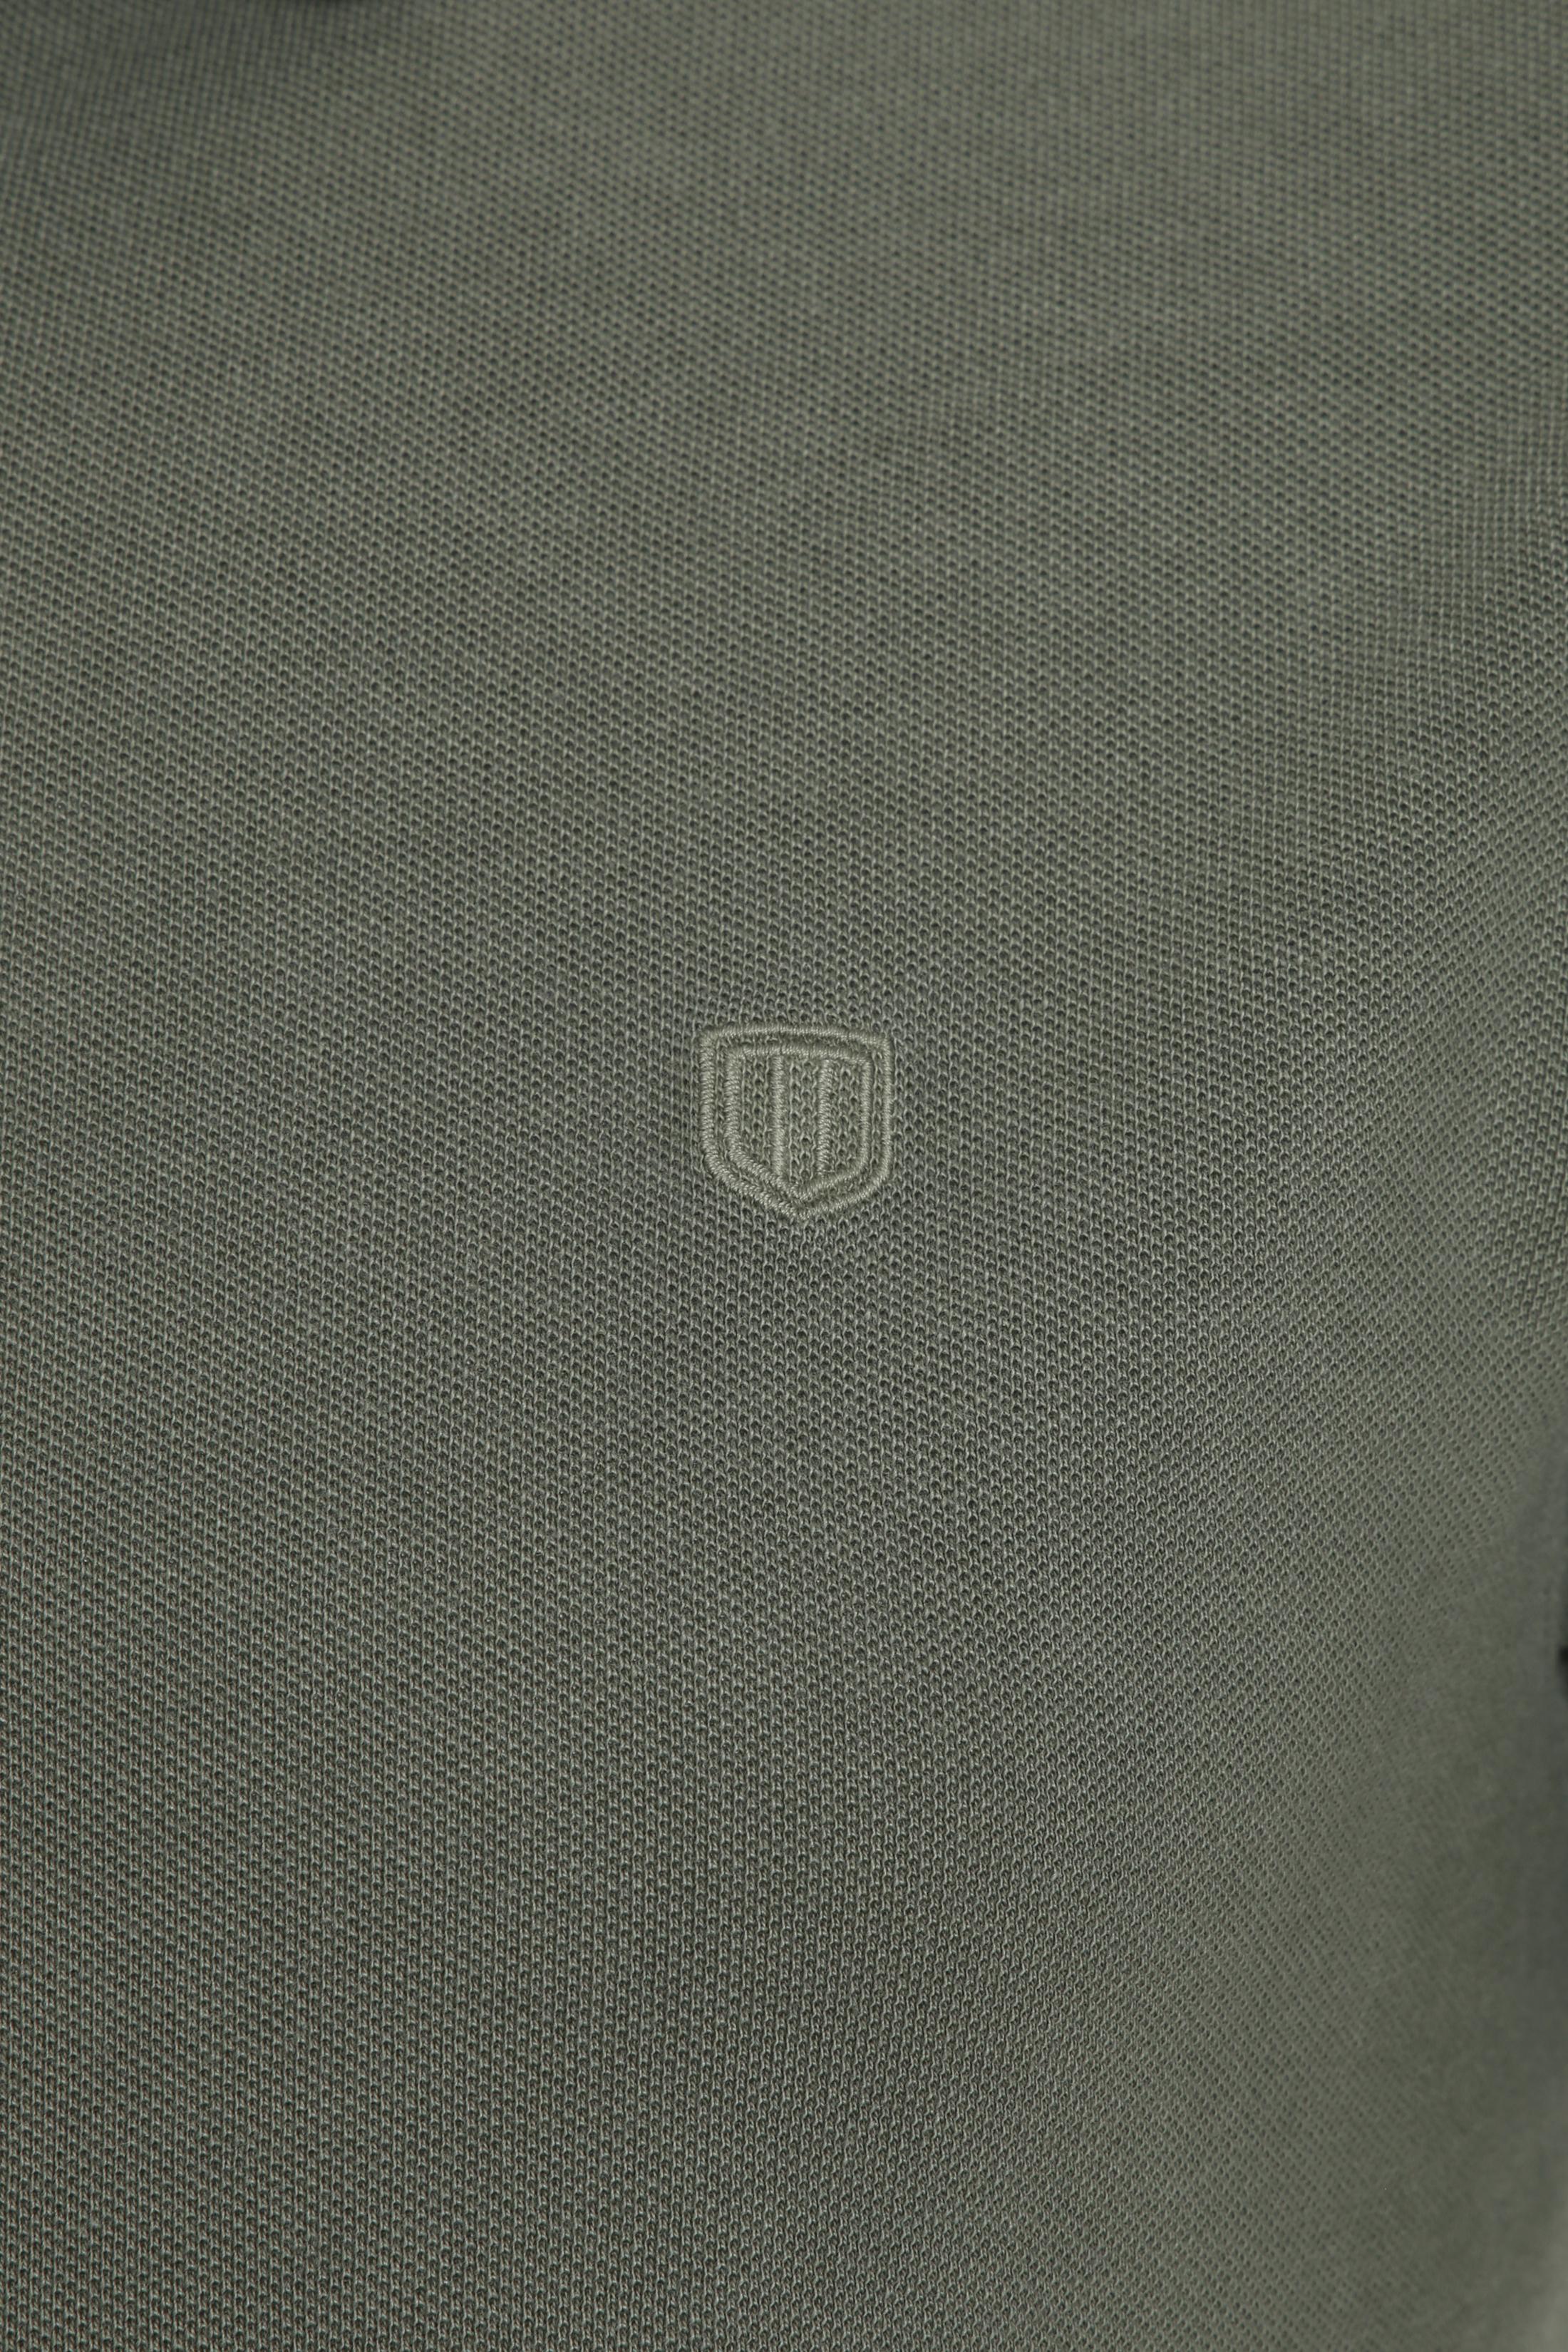 Profuomo Poloshirt Garment Groen foto 1